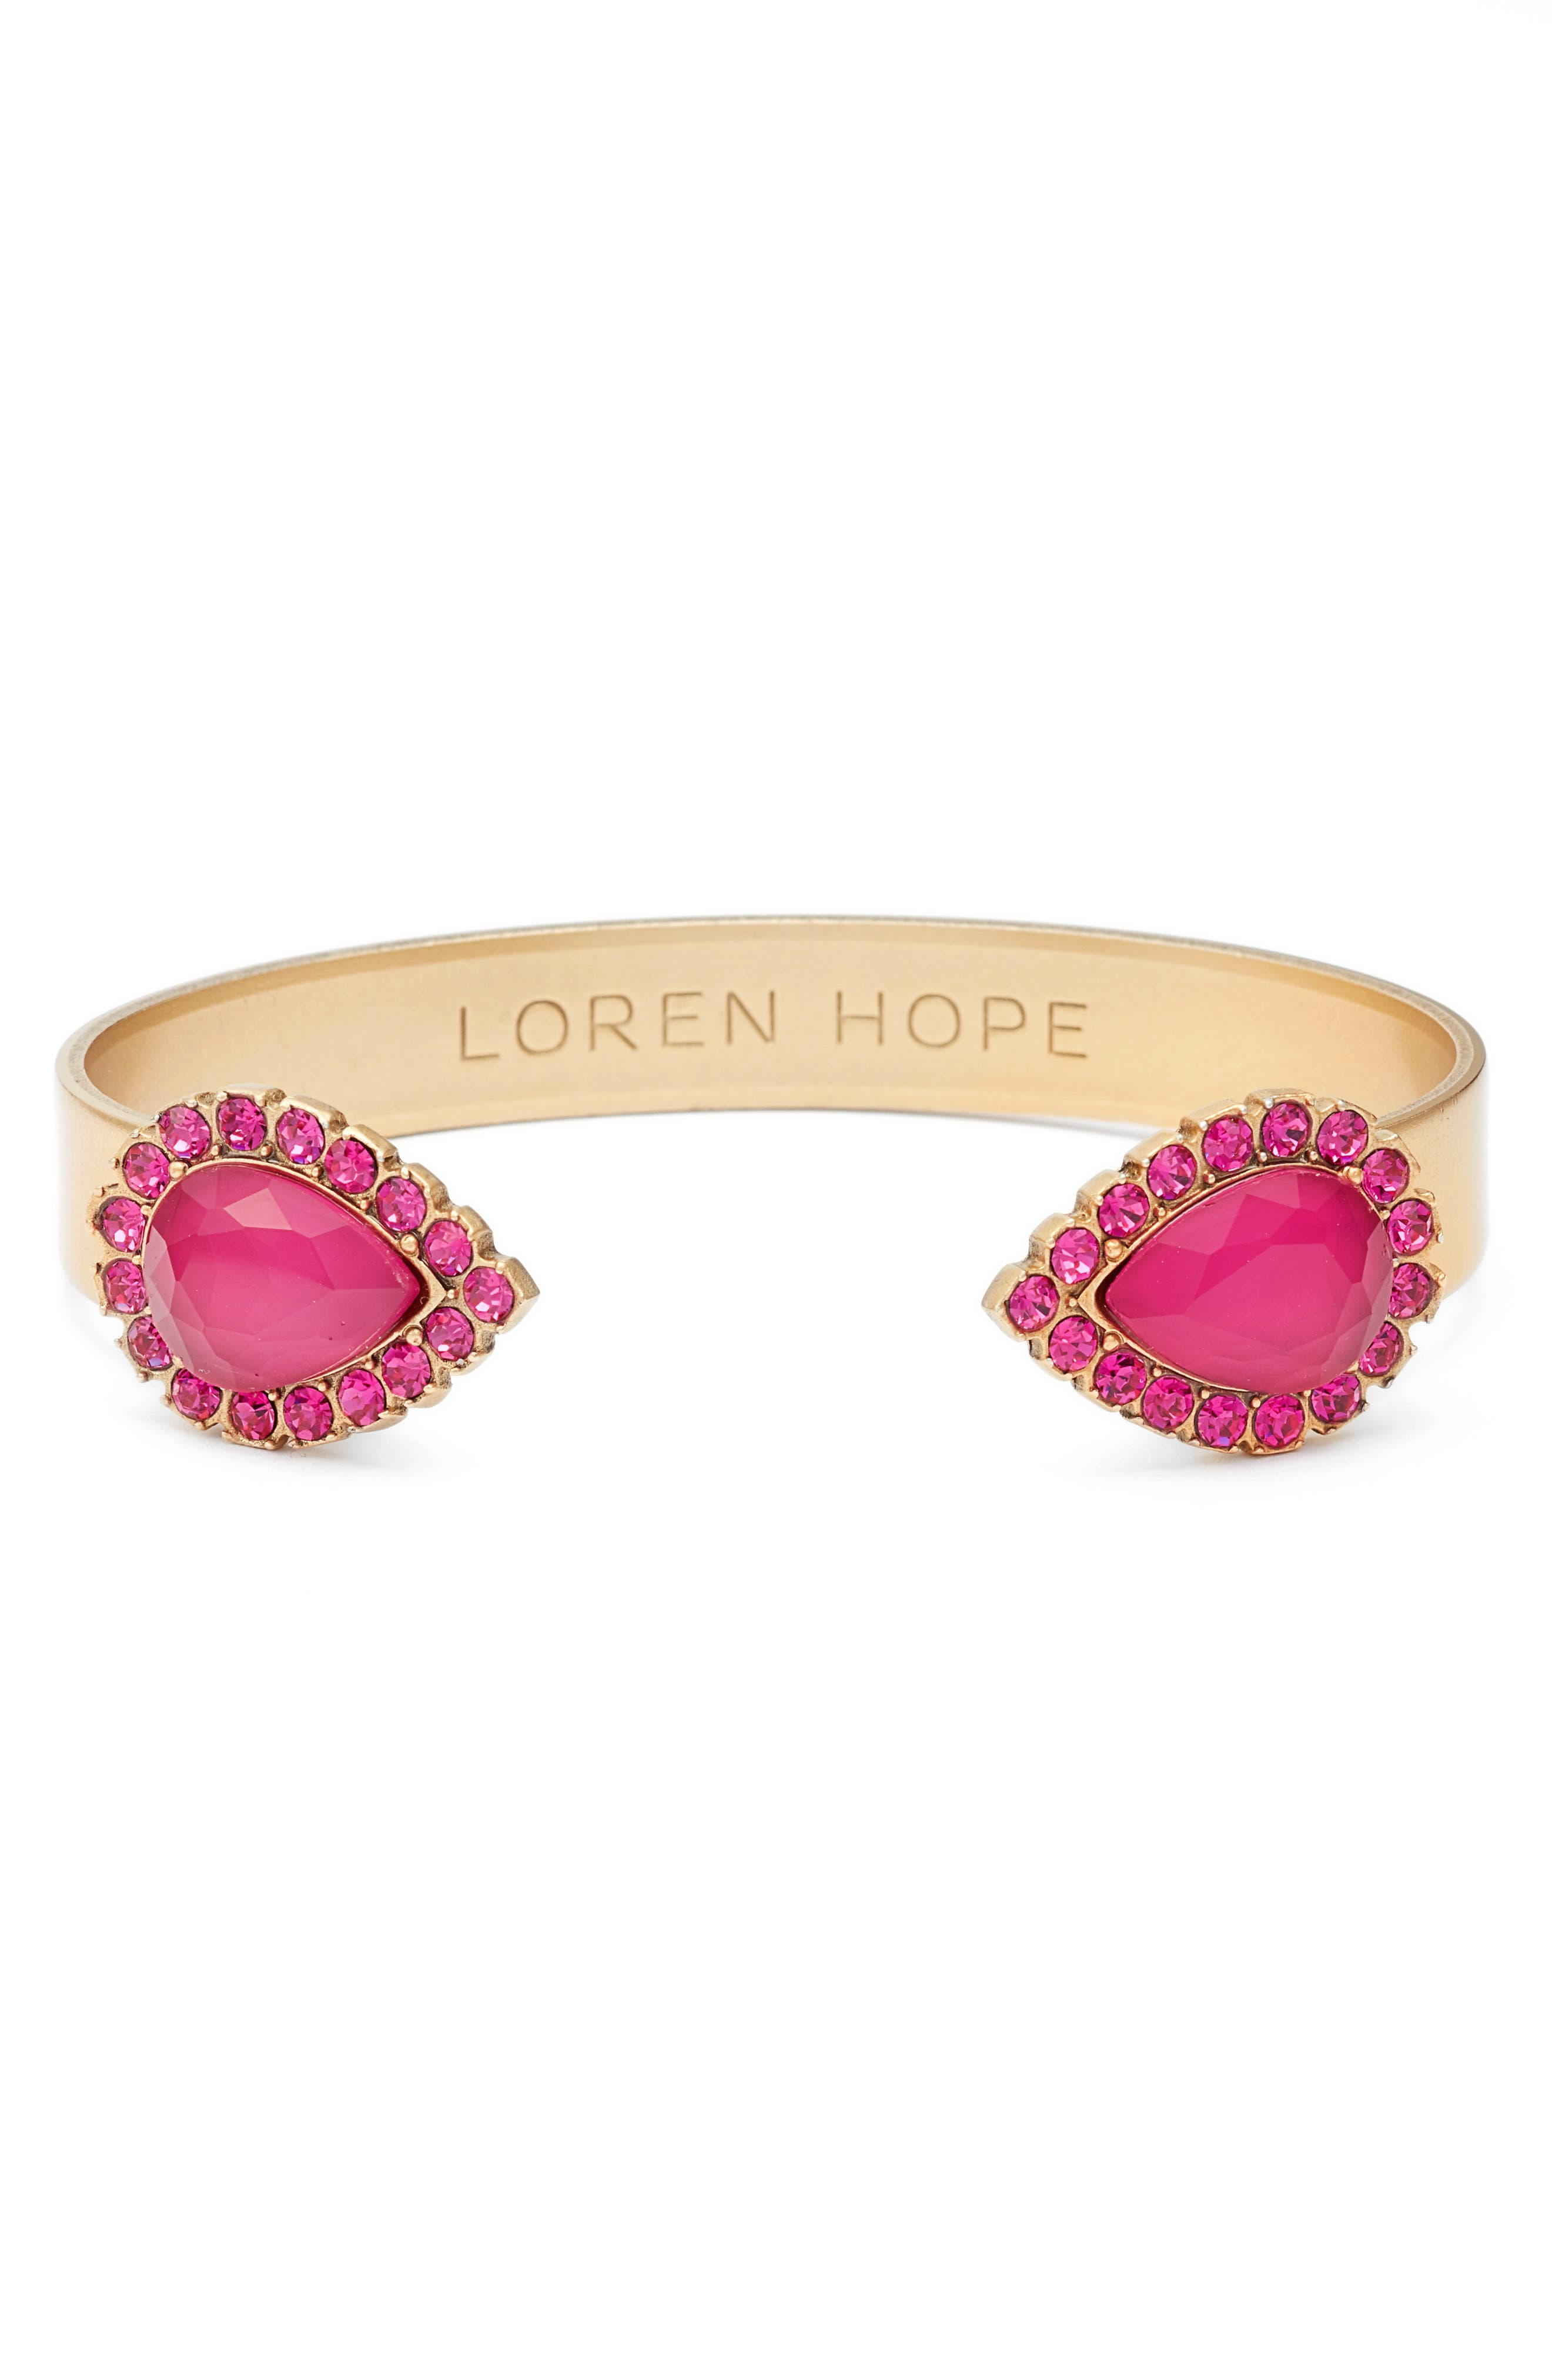 Alternate Image 1 Selected - Loren Hope 'Sarra' Crystal Cuff